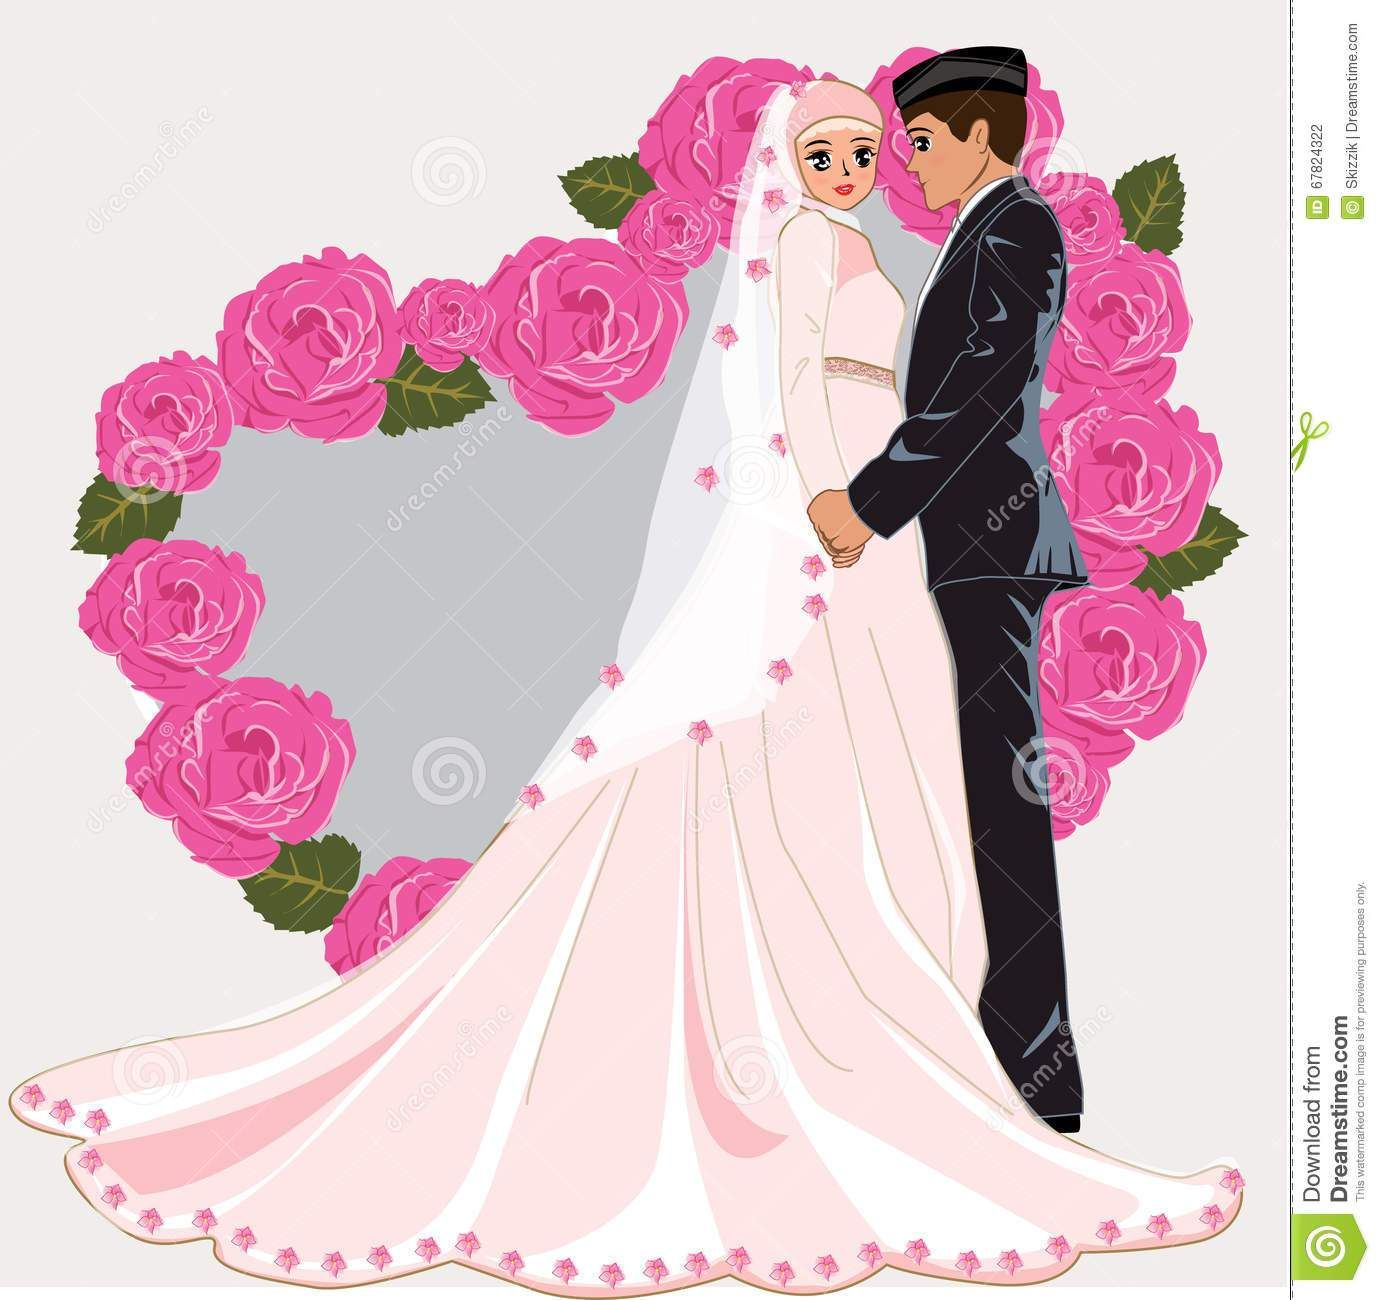 Kartun Muslim Couple Kolek Gambar Gambar Pengantin Gambar Pertunangan Pengantin